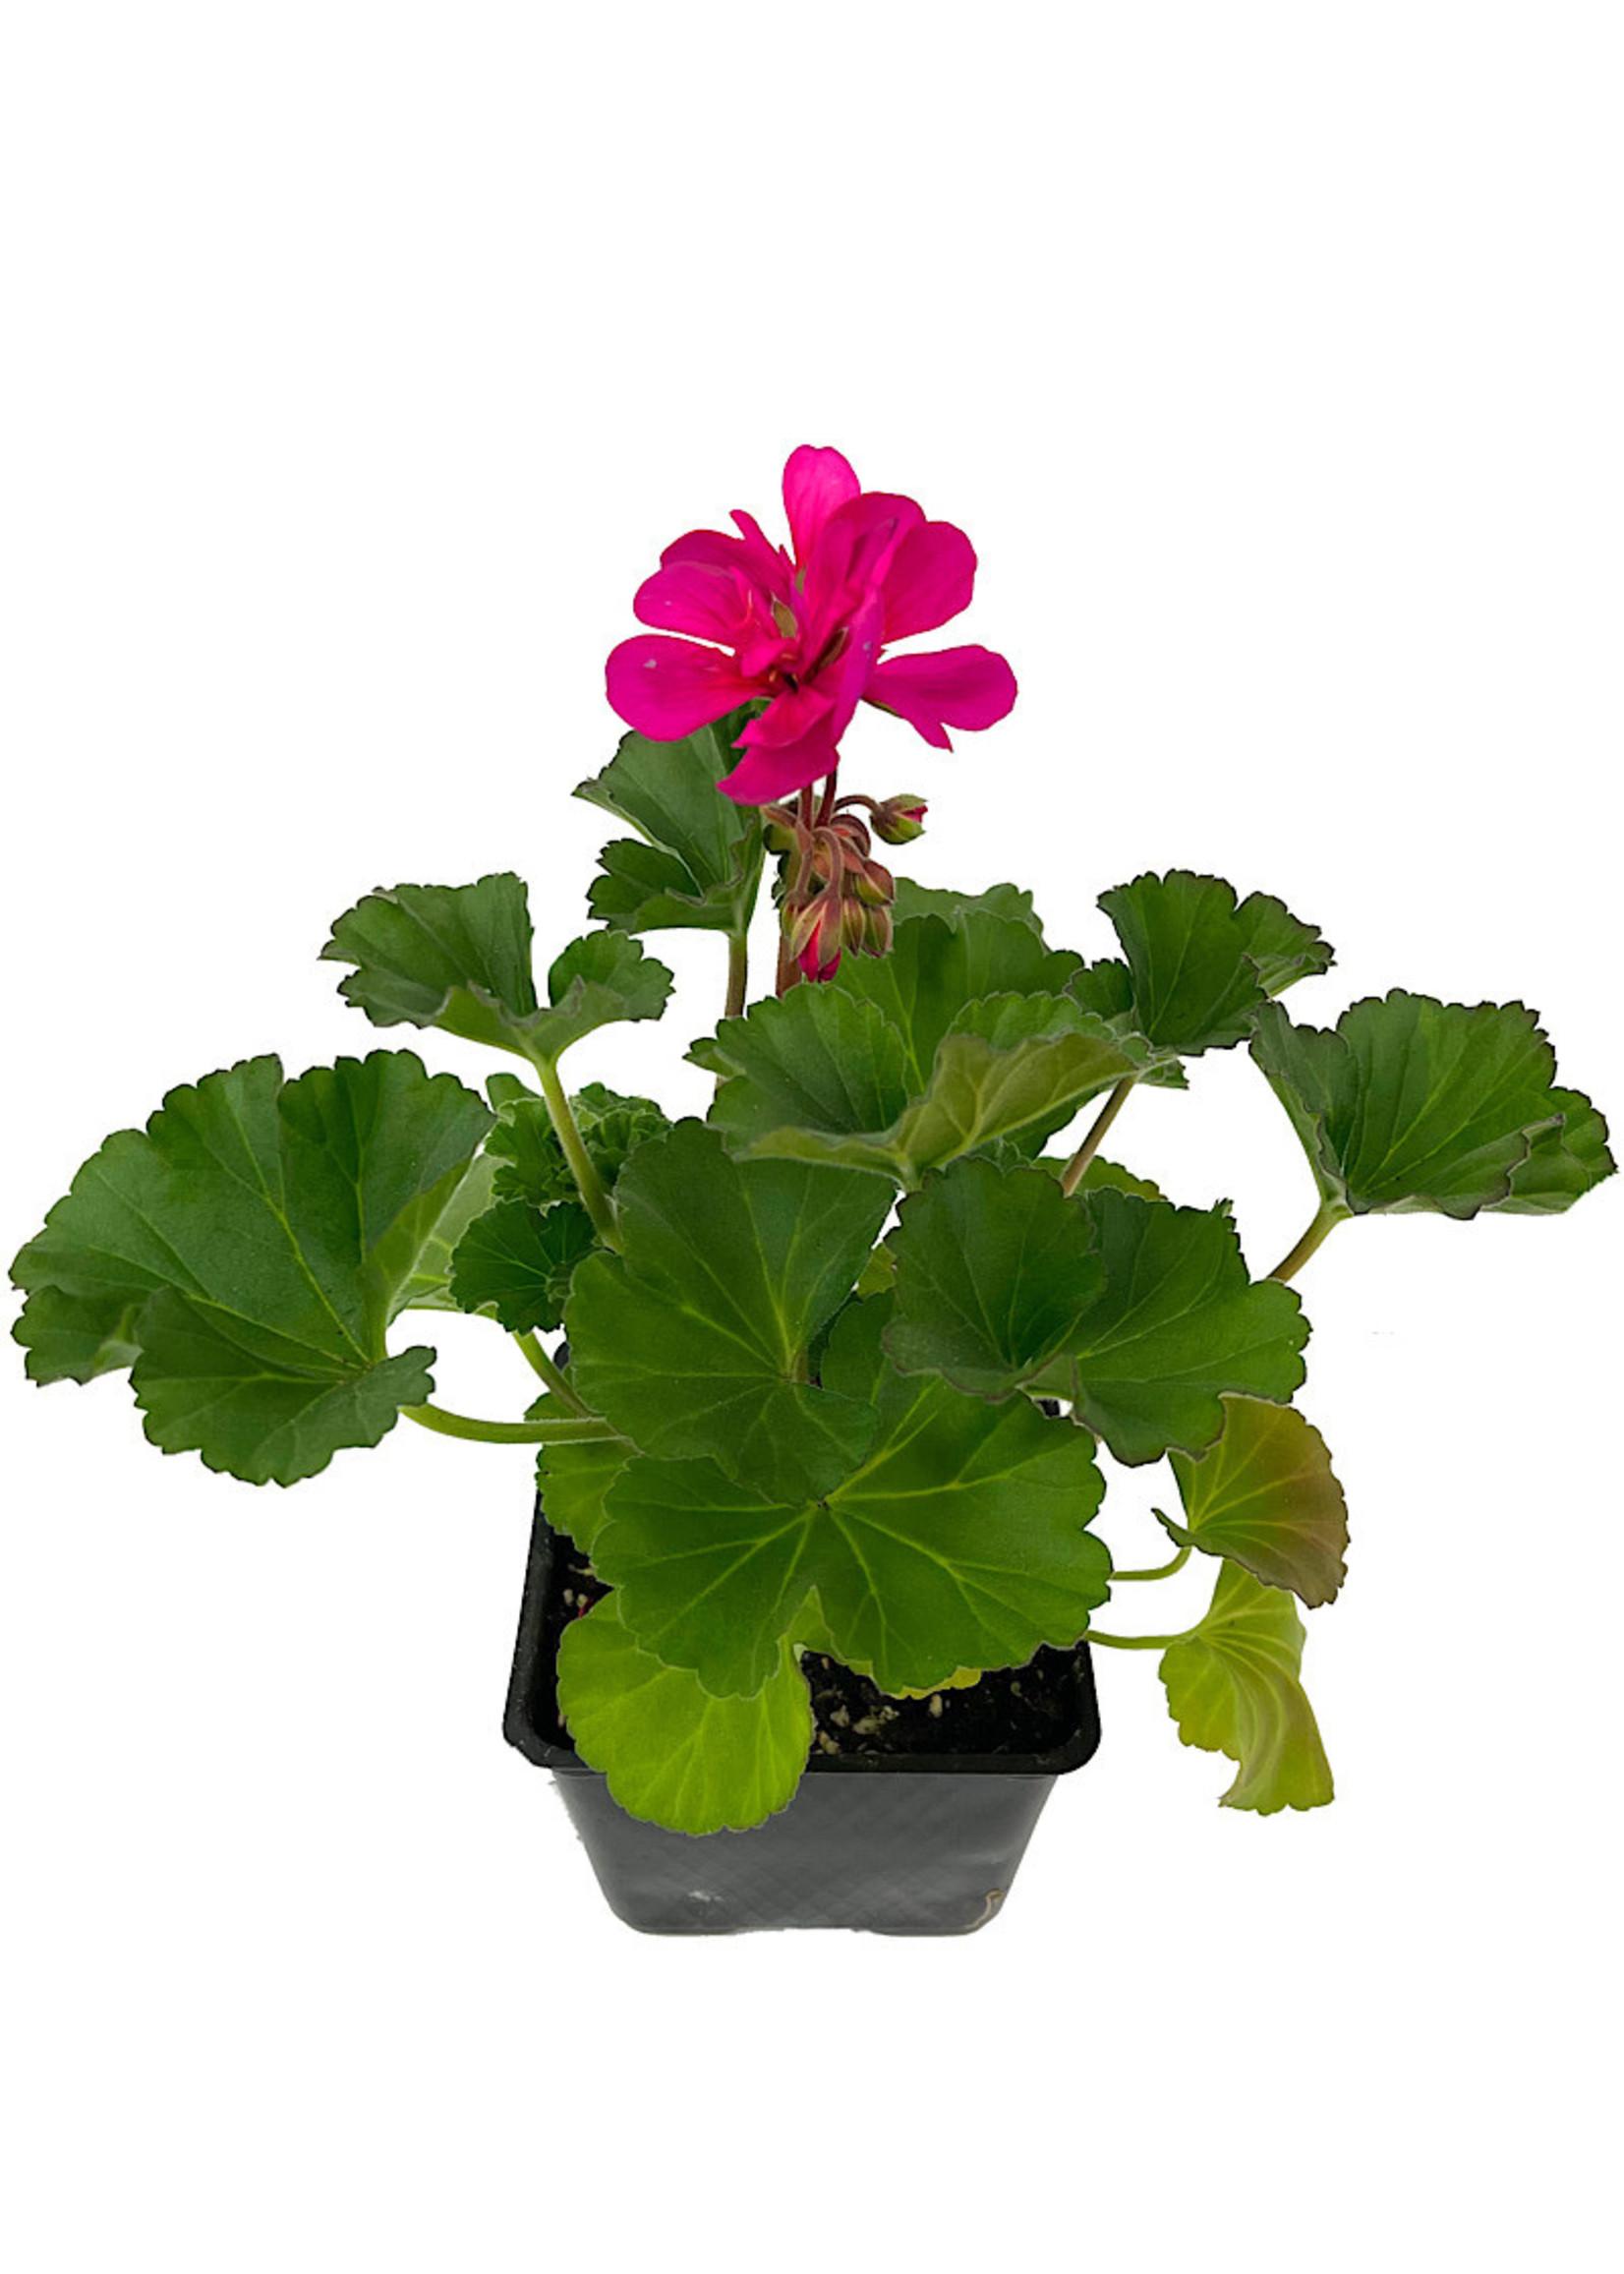 Geranium Zonal 'Tango Violet' 4 Inch